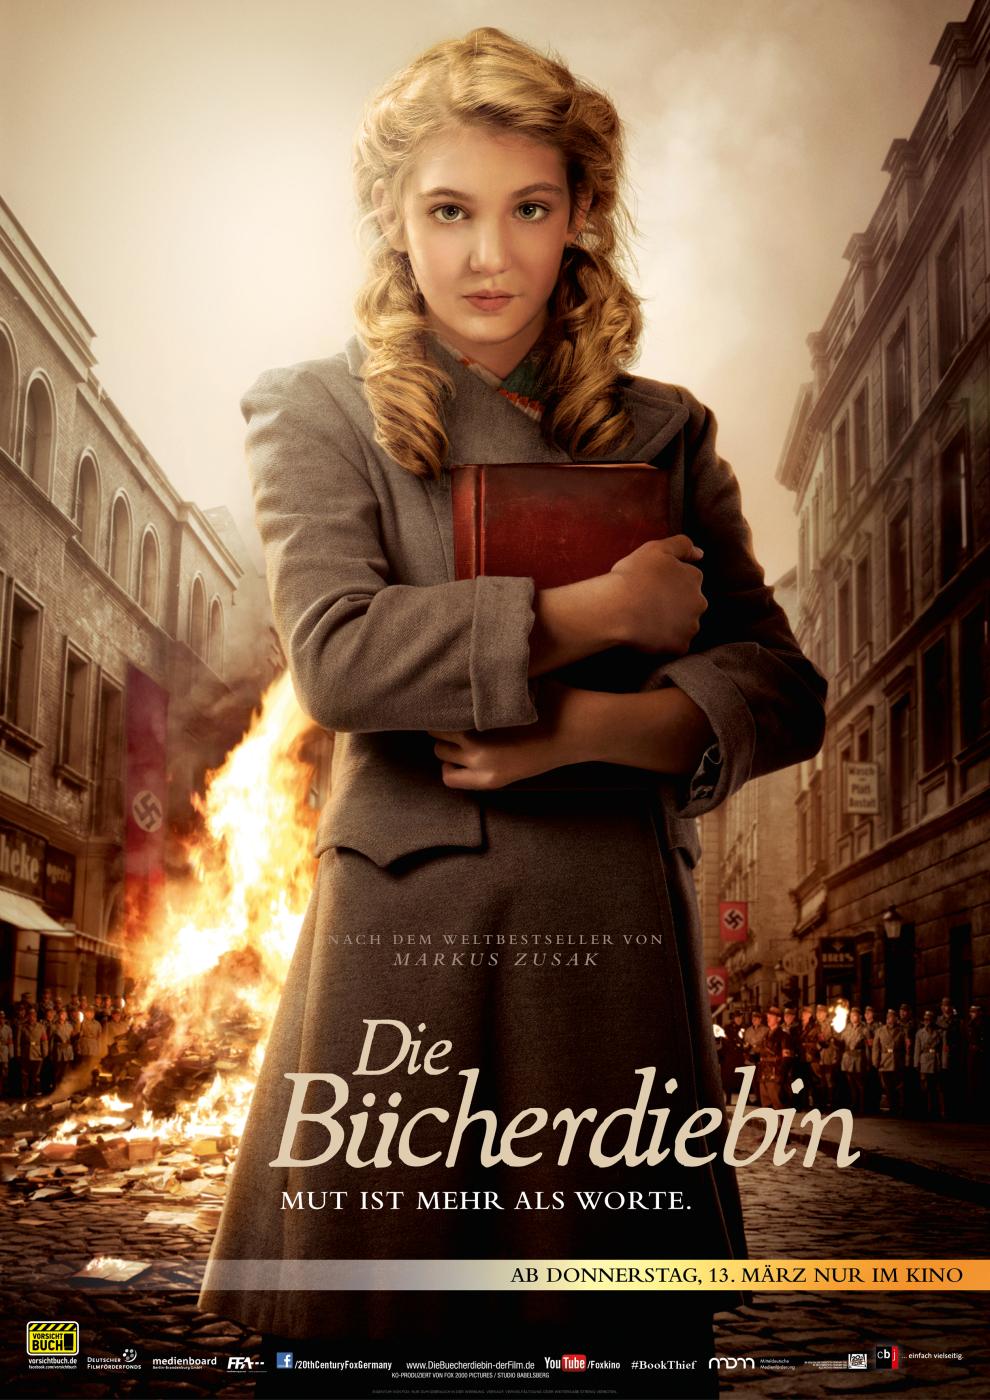 http://www.fbw-filmbewertung.com/film/die_buecherdiebin